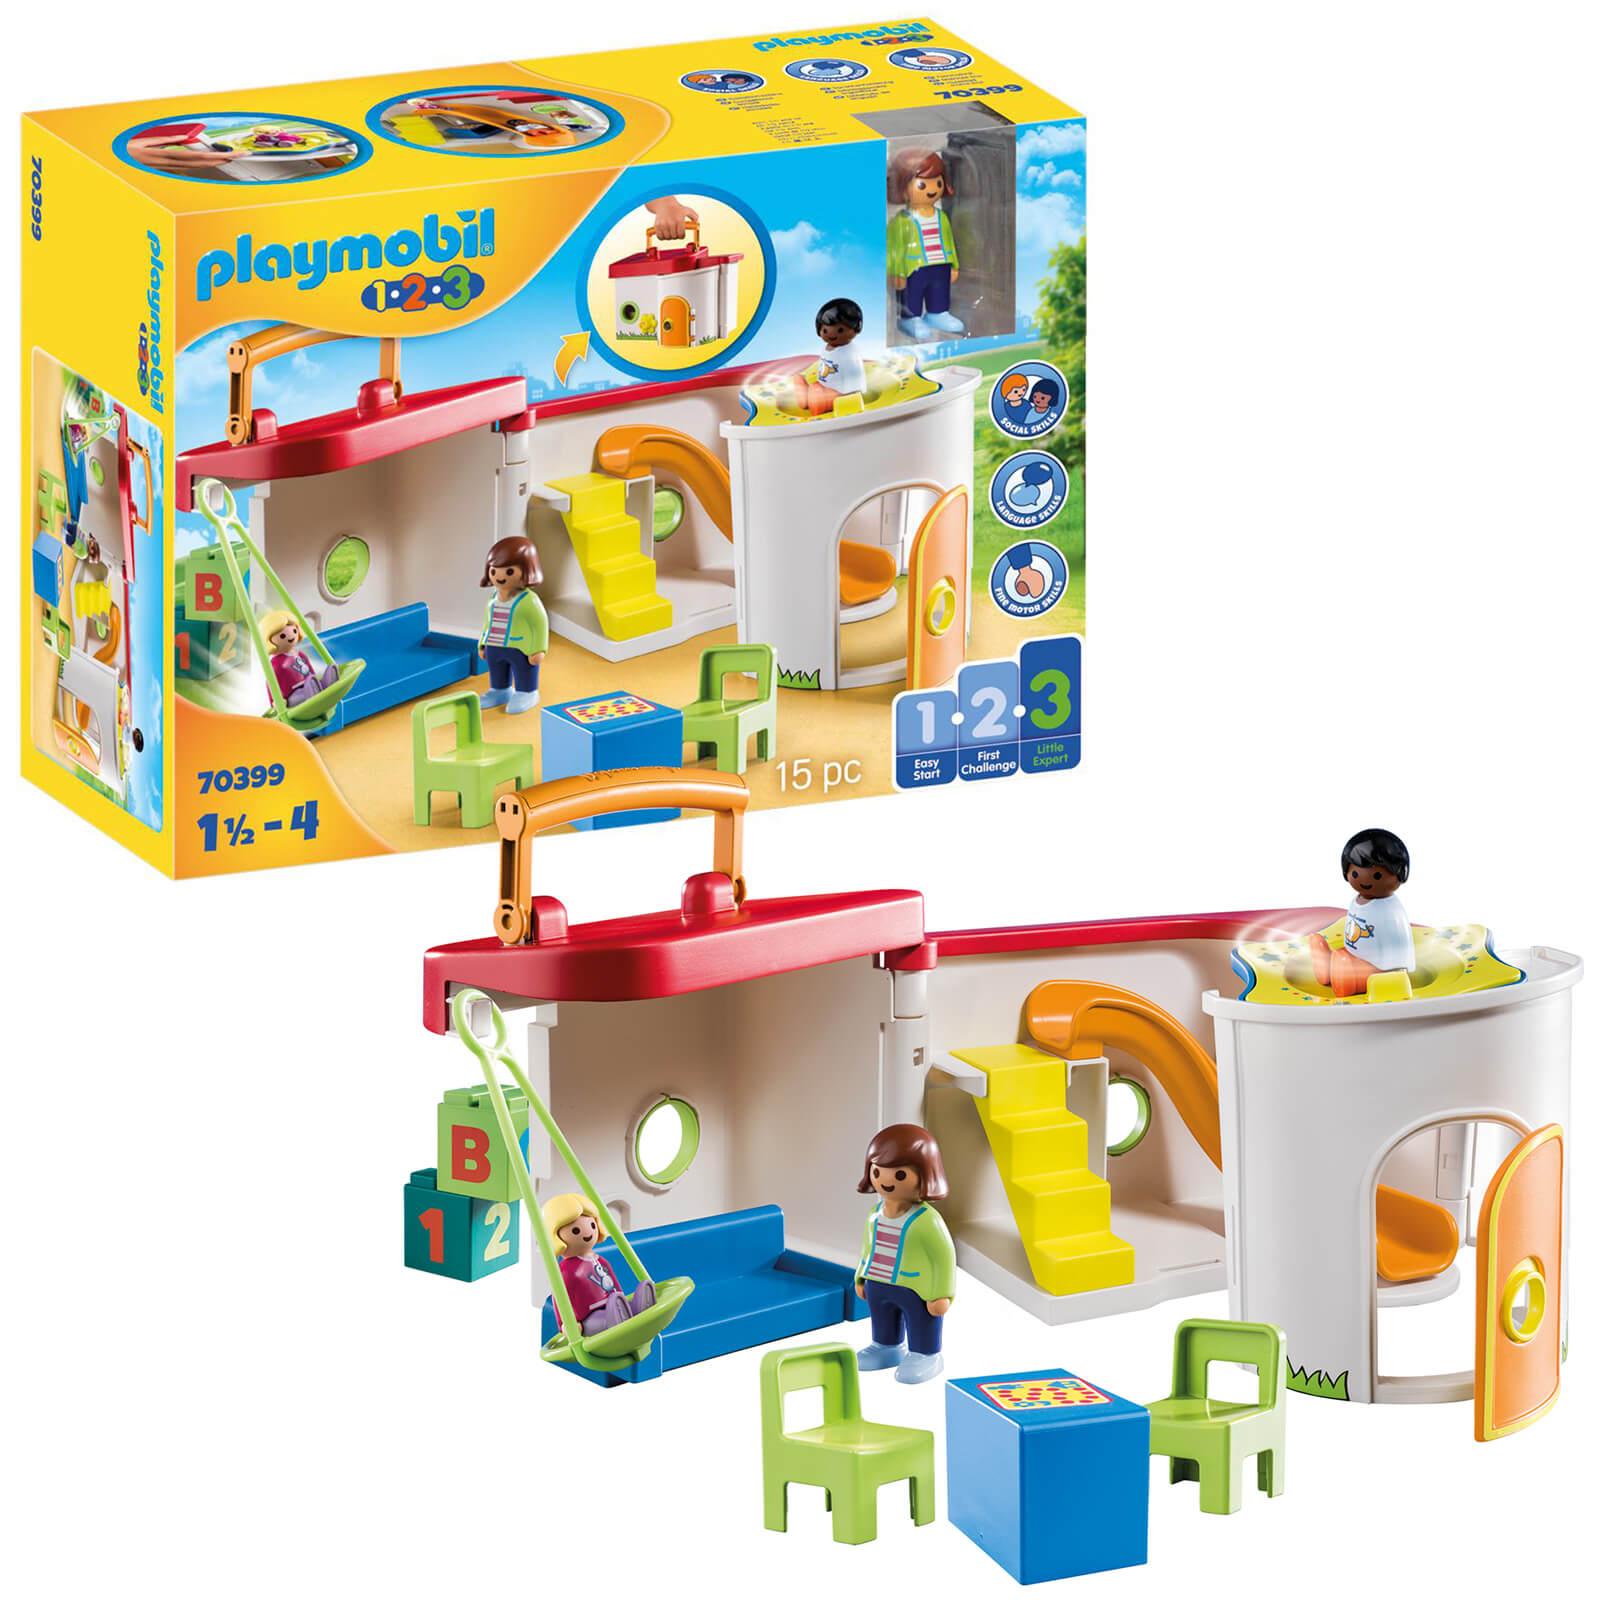 Playmobil 1.2.3 My Take Along Preschool For 18+ Months (70399)